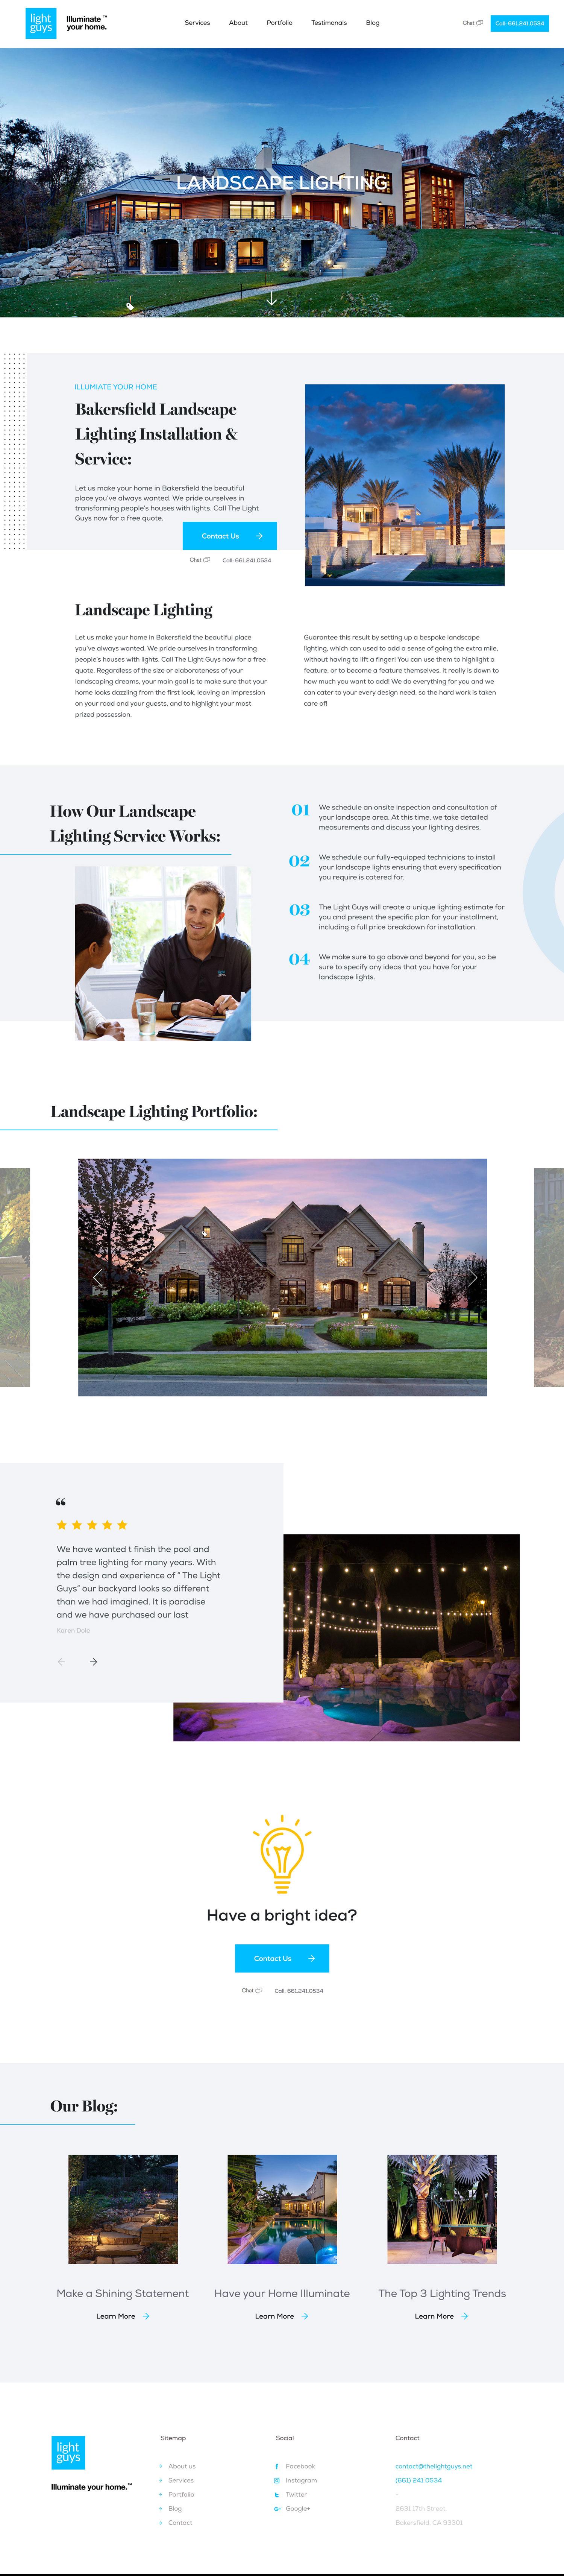 Web Design | Light Guys - Landscape + Lighting (Desktop View)